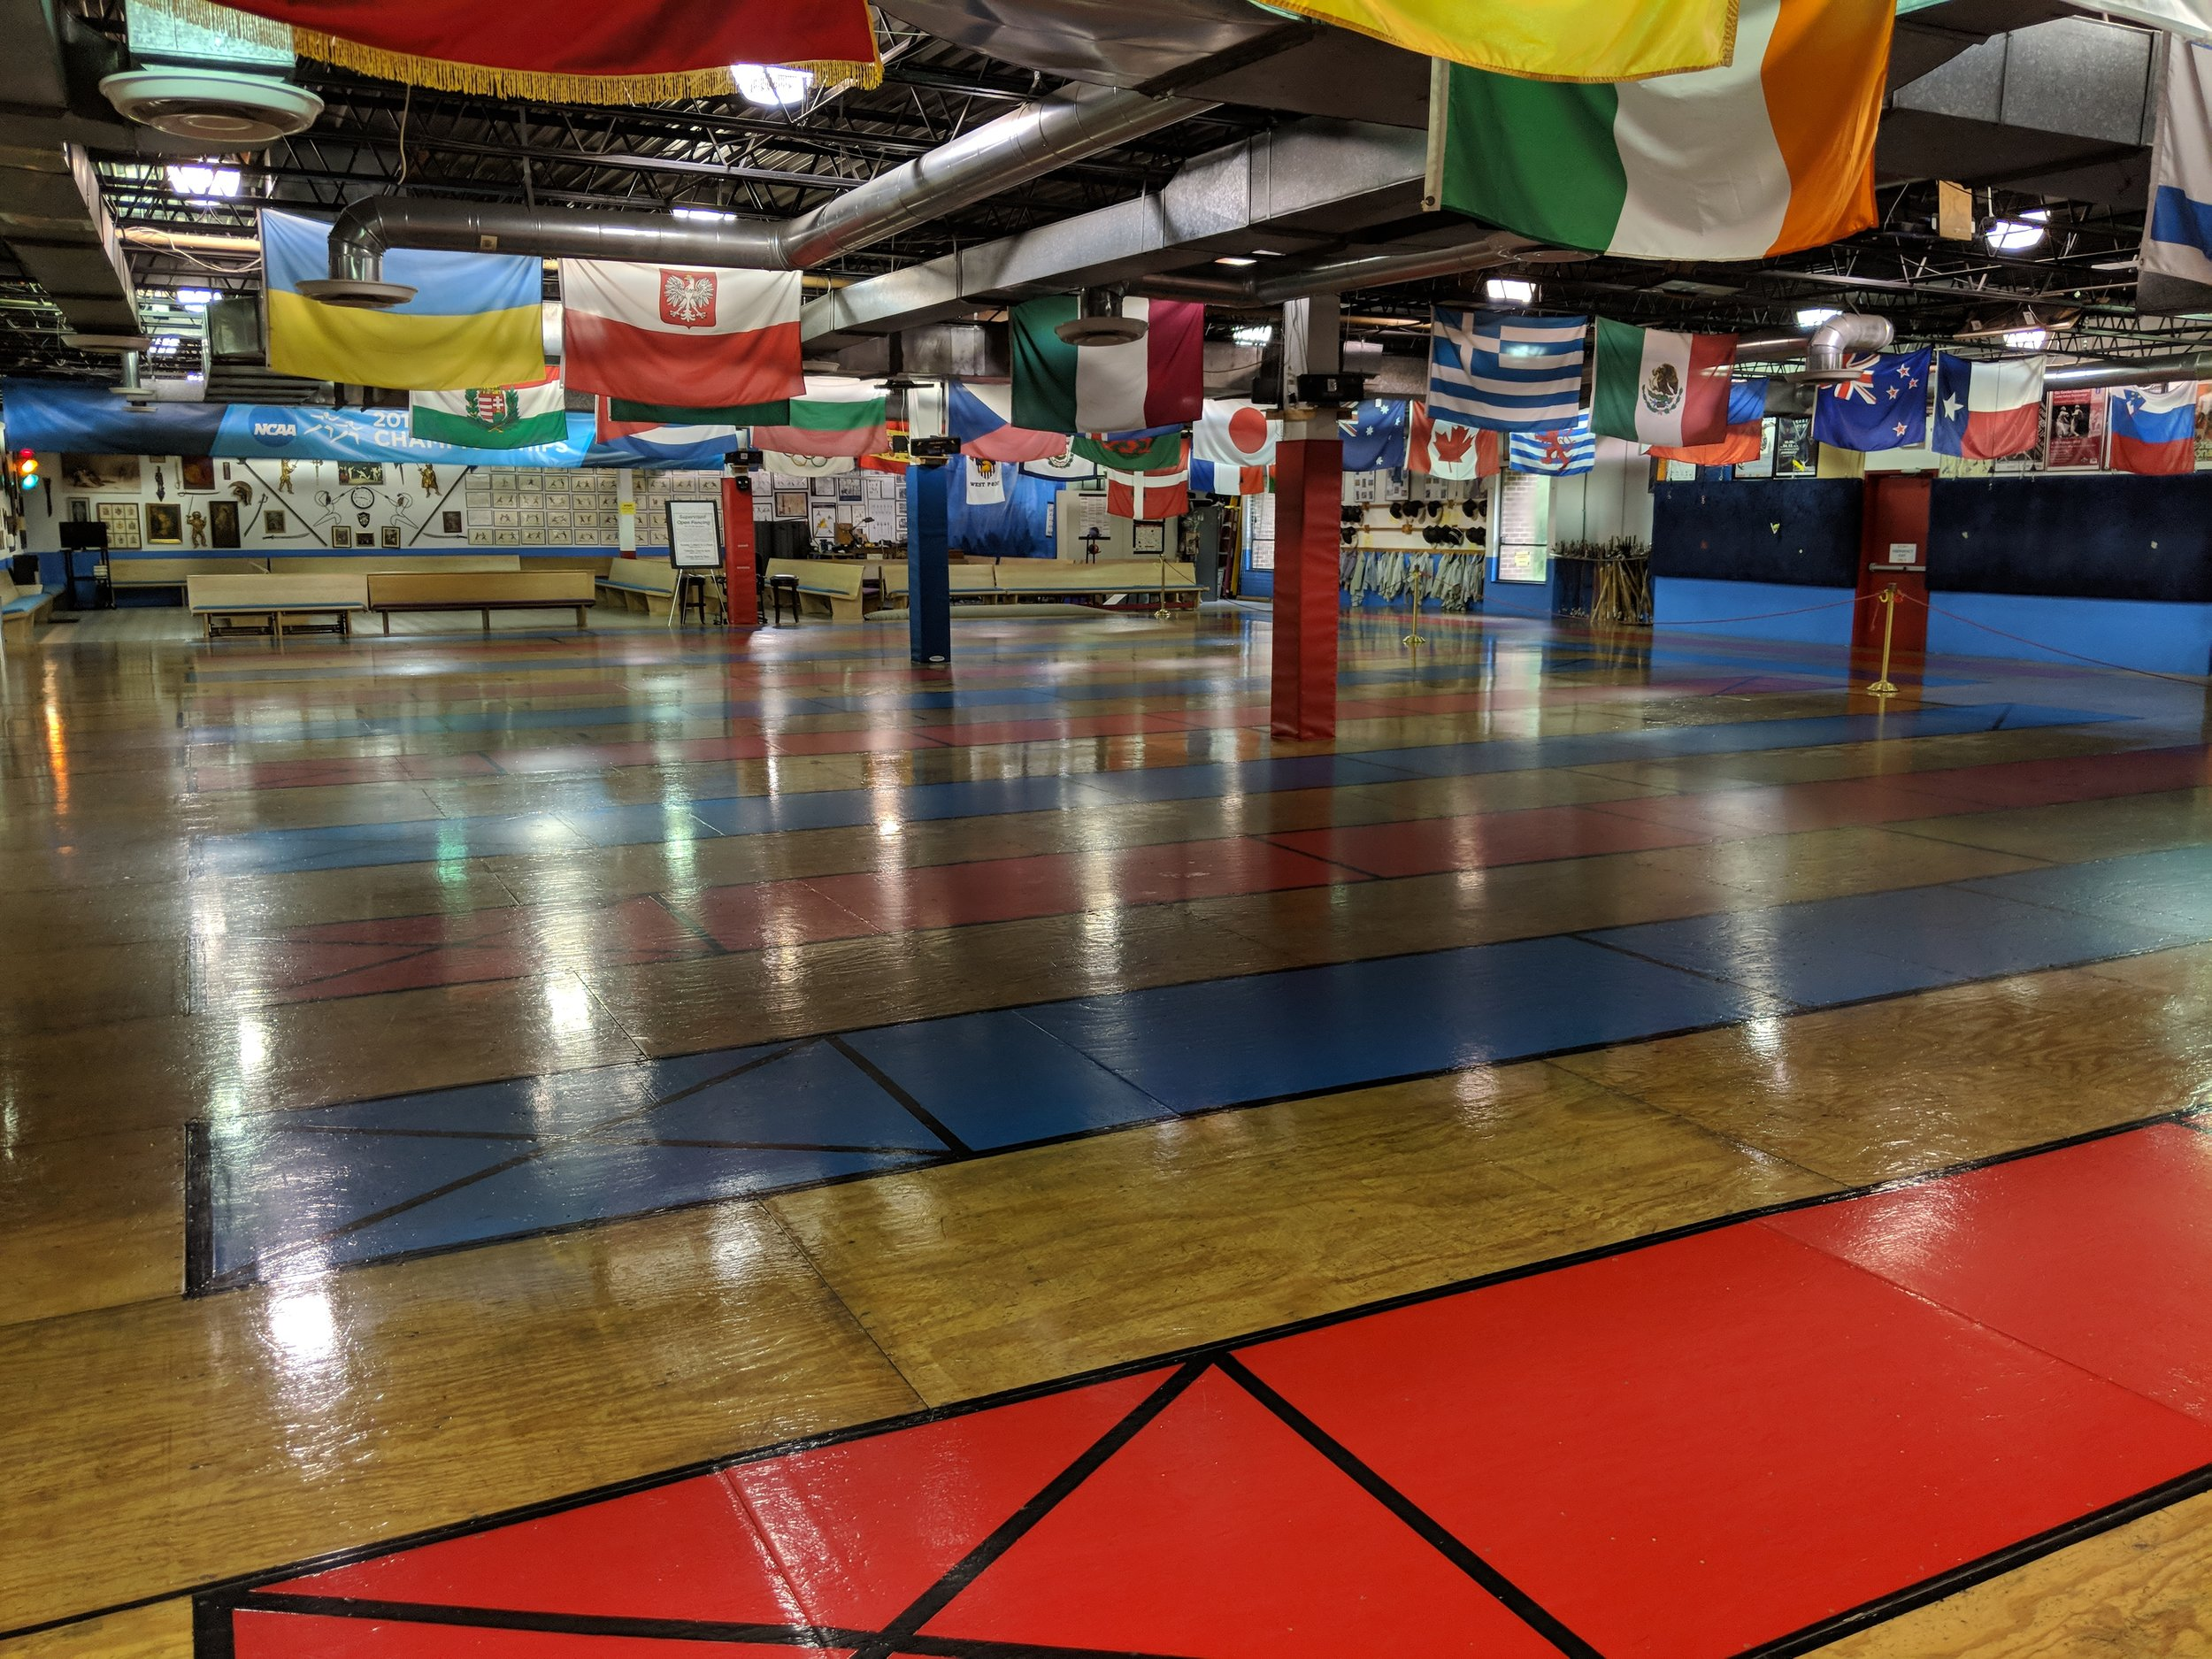 Fencing Floor